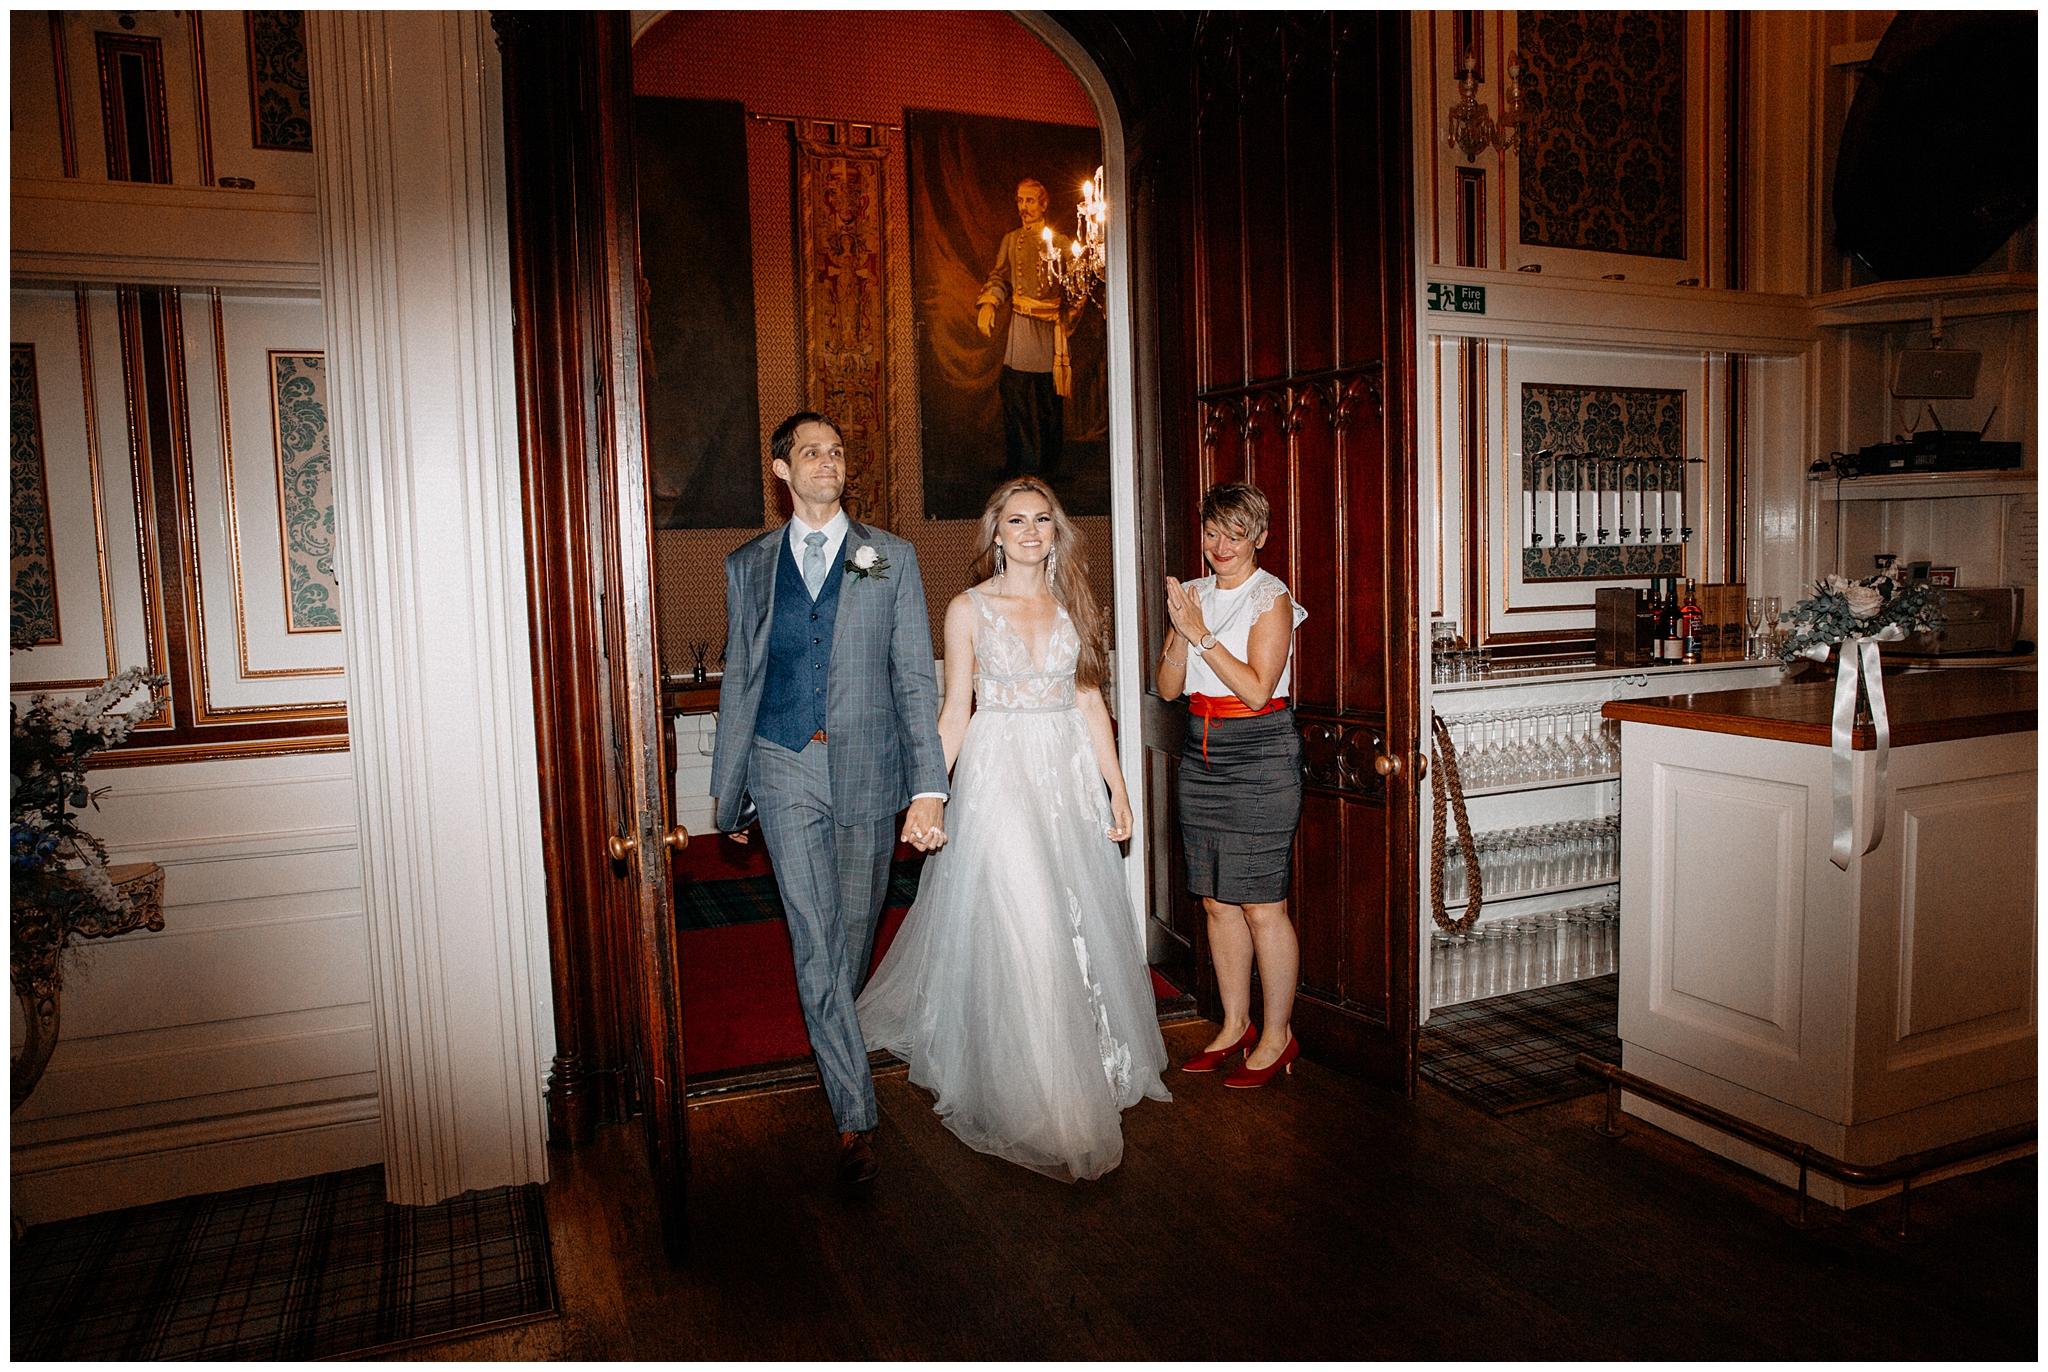 austin-texas-scottish-wedding-bride-groom22022.JPG